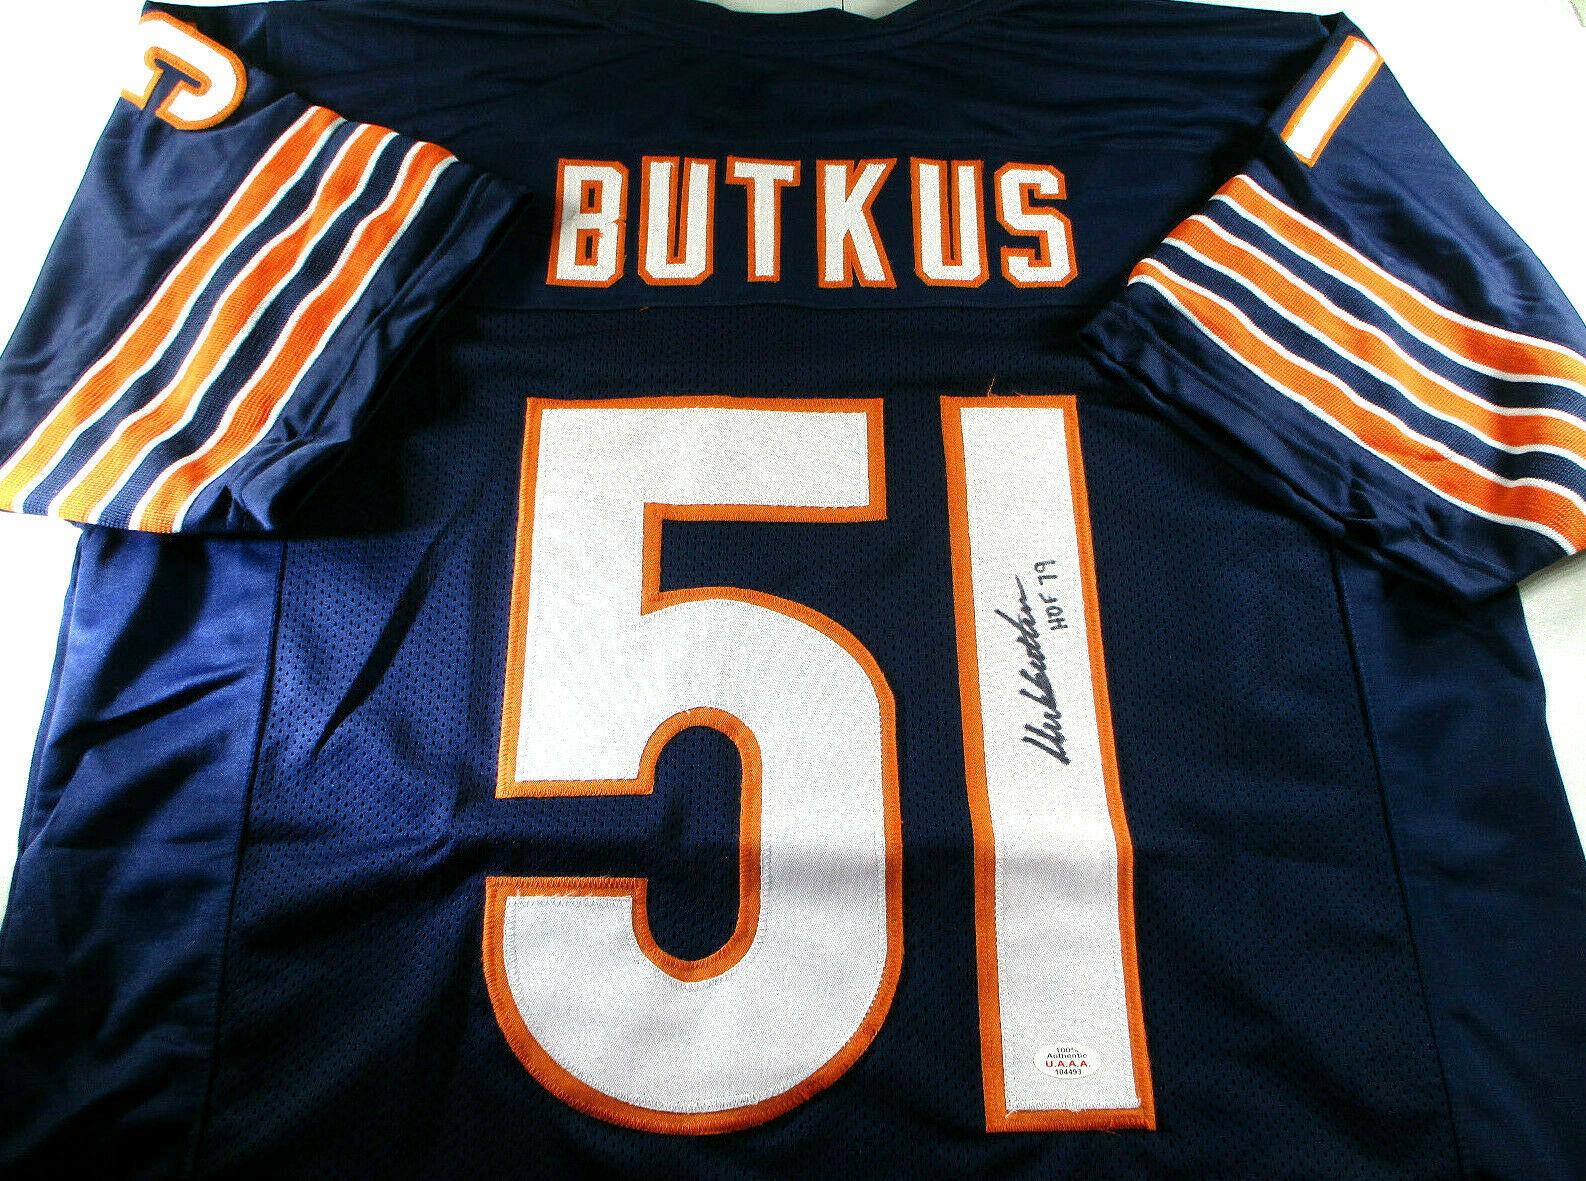 DICK BUTKUS / NFL HALL OF FAME / AUTOGRAPHED CHICAGO BEARS CUSTOM JERSEY / COA